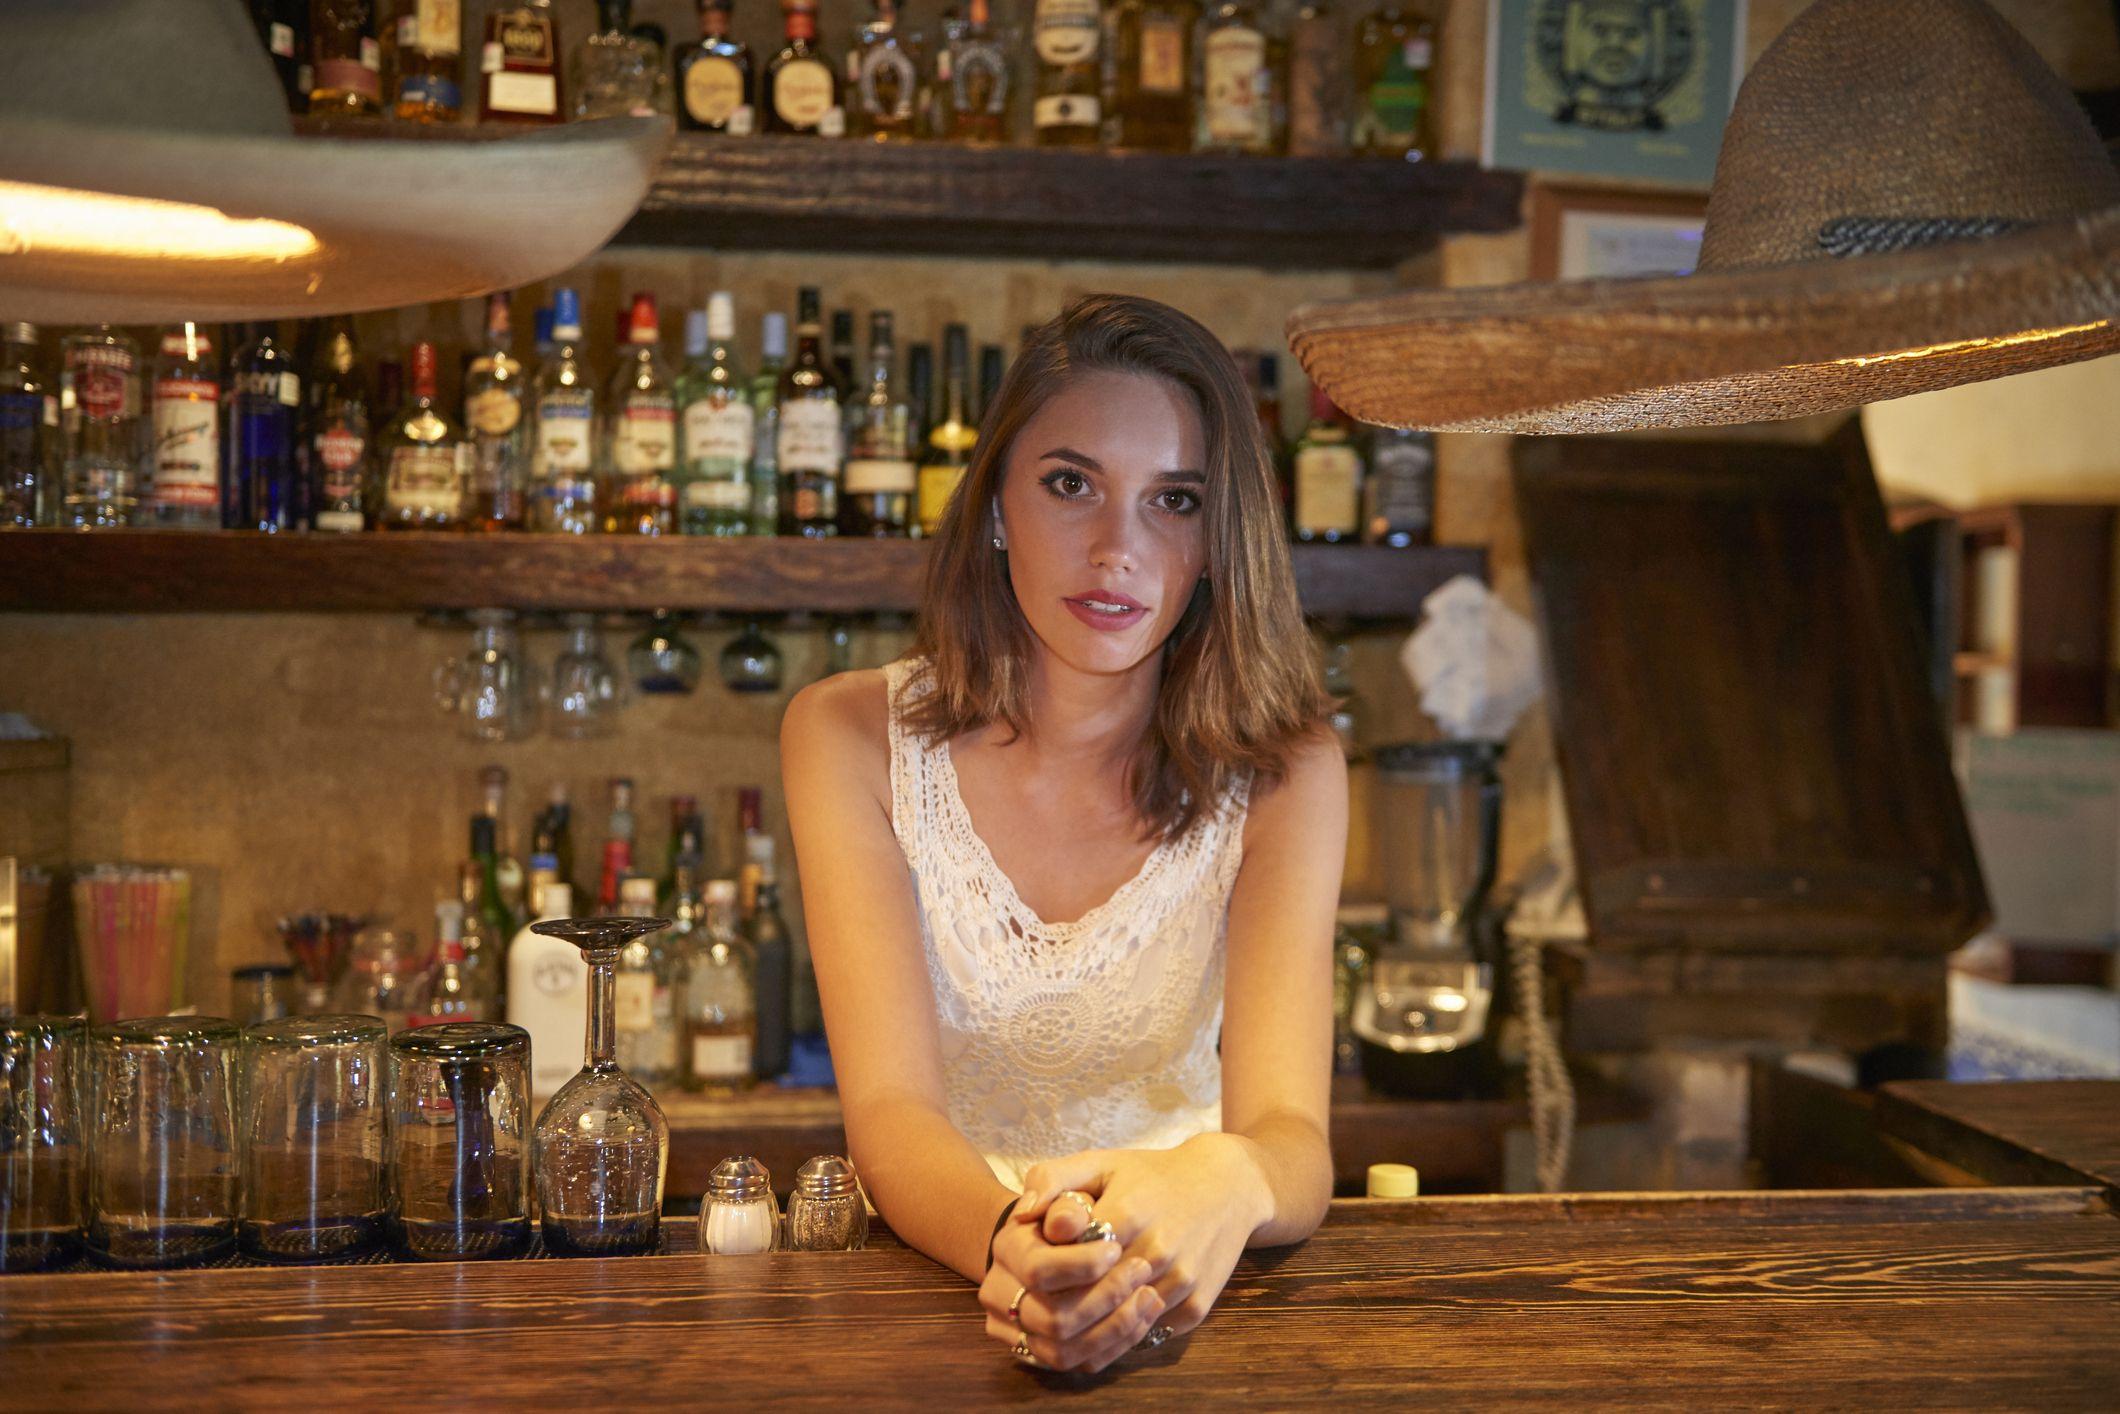 Appuntamenti cocktail cameriera